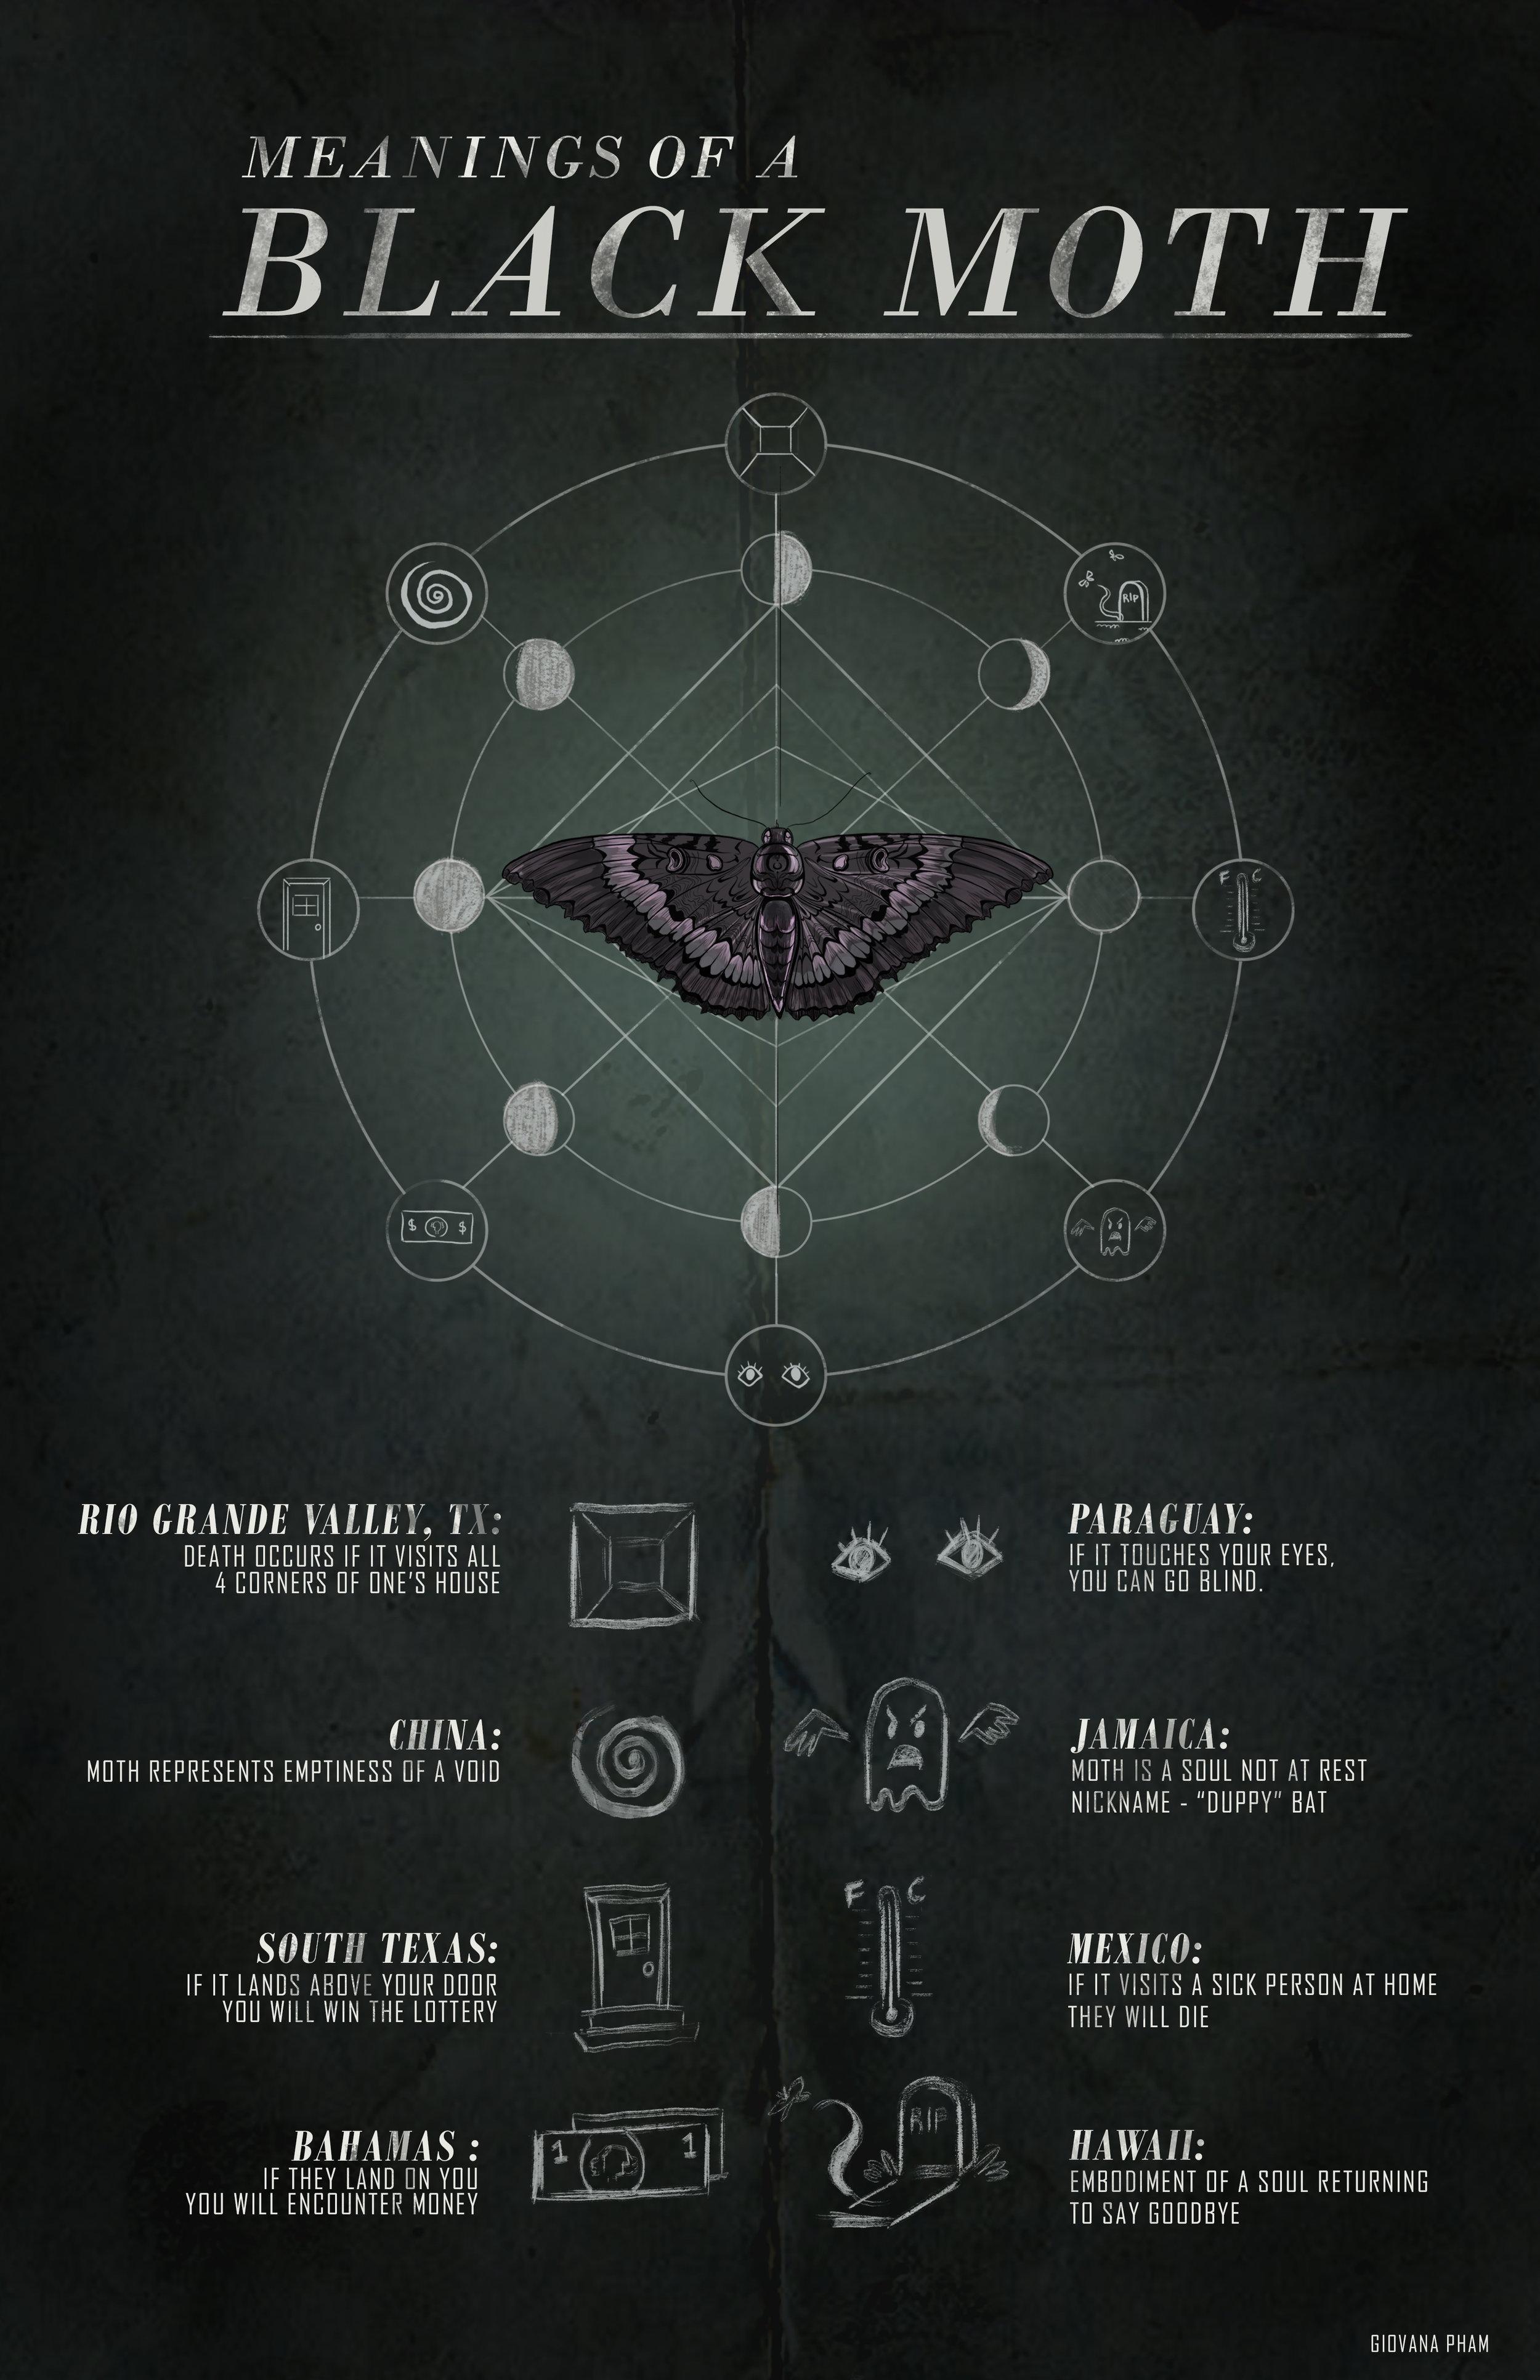 black_moth_infographic_final.jpg